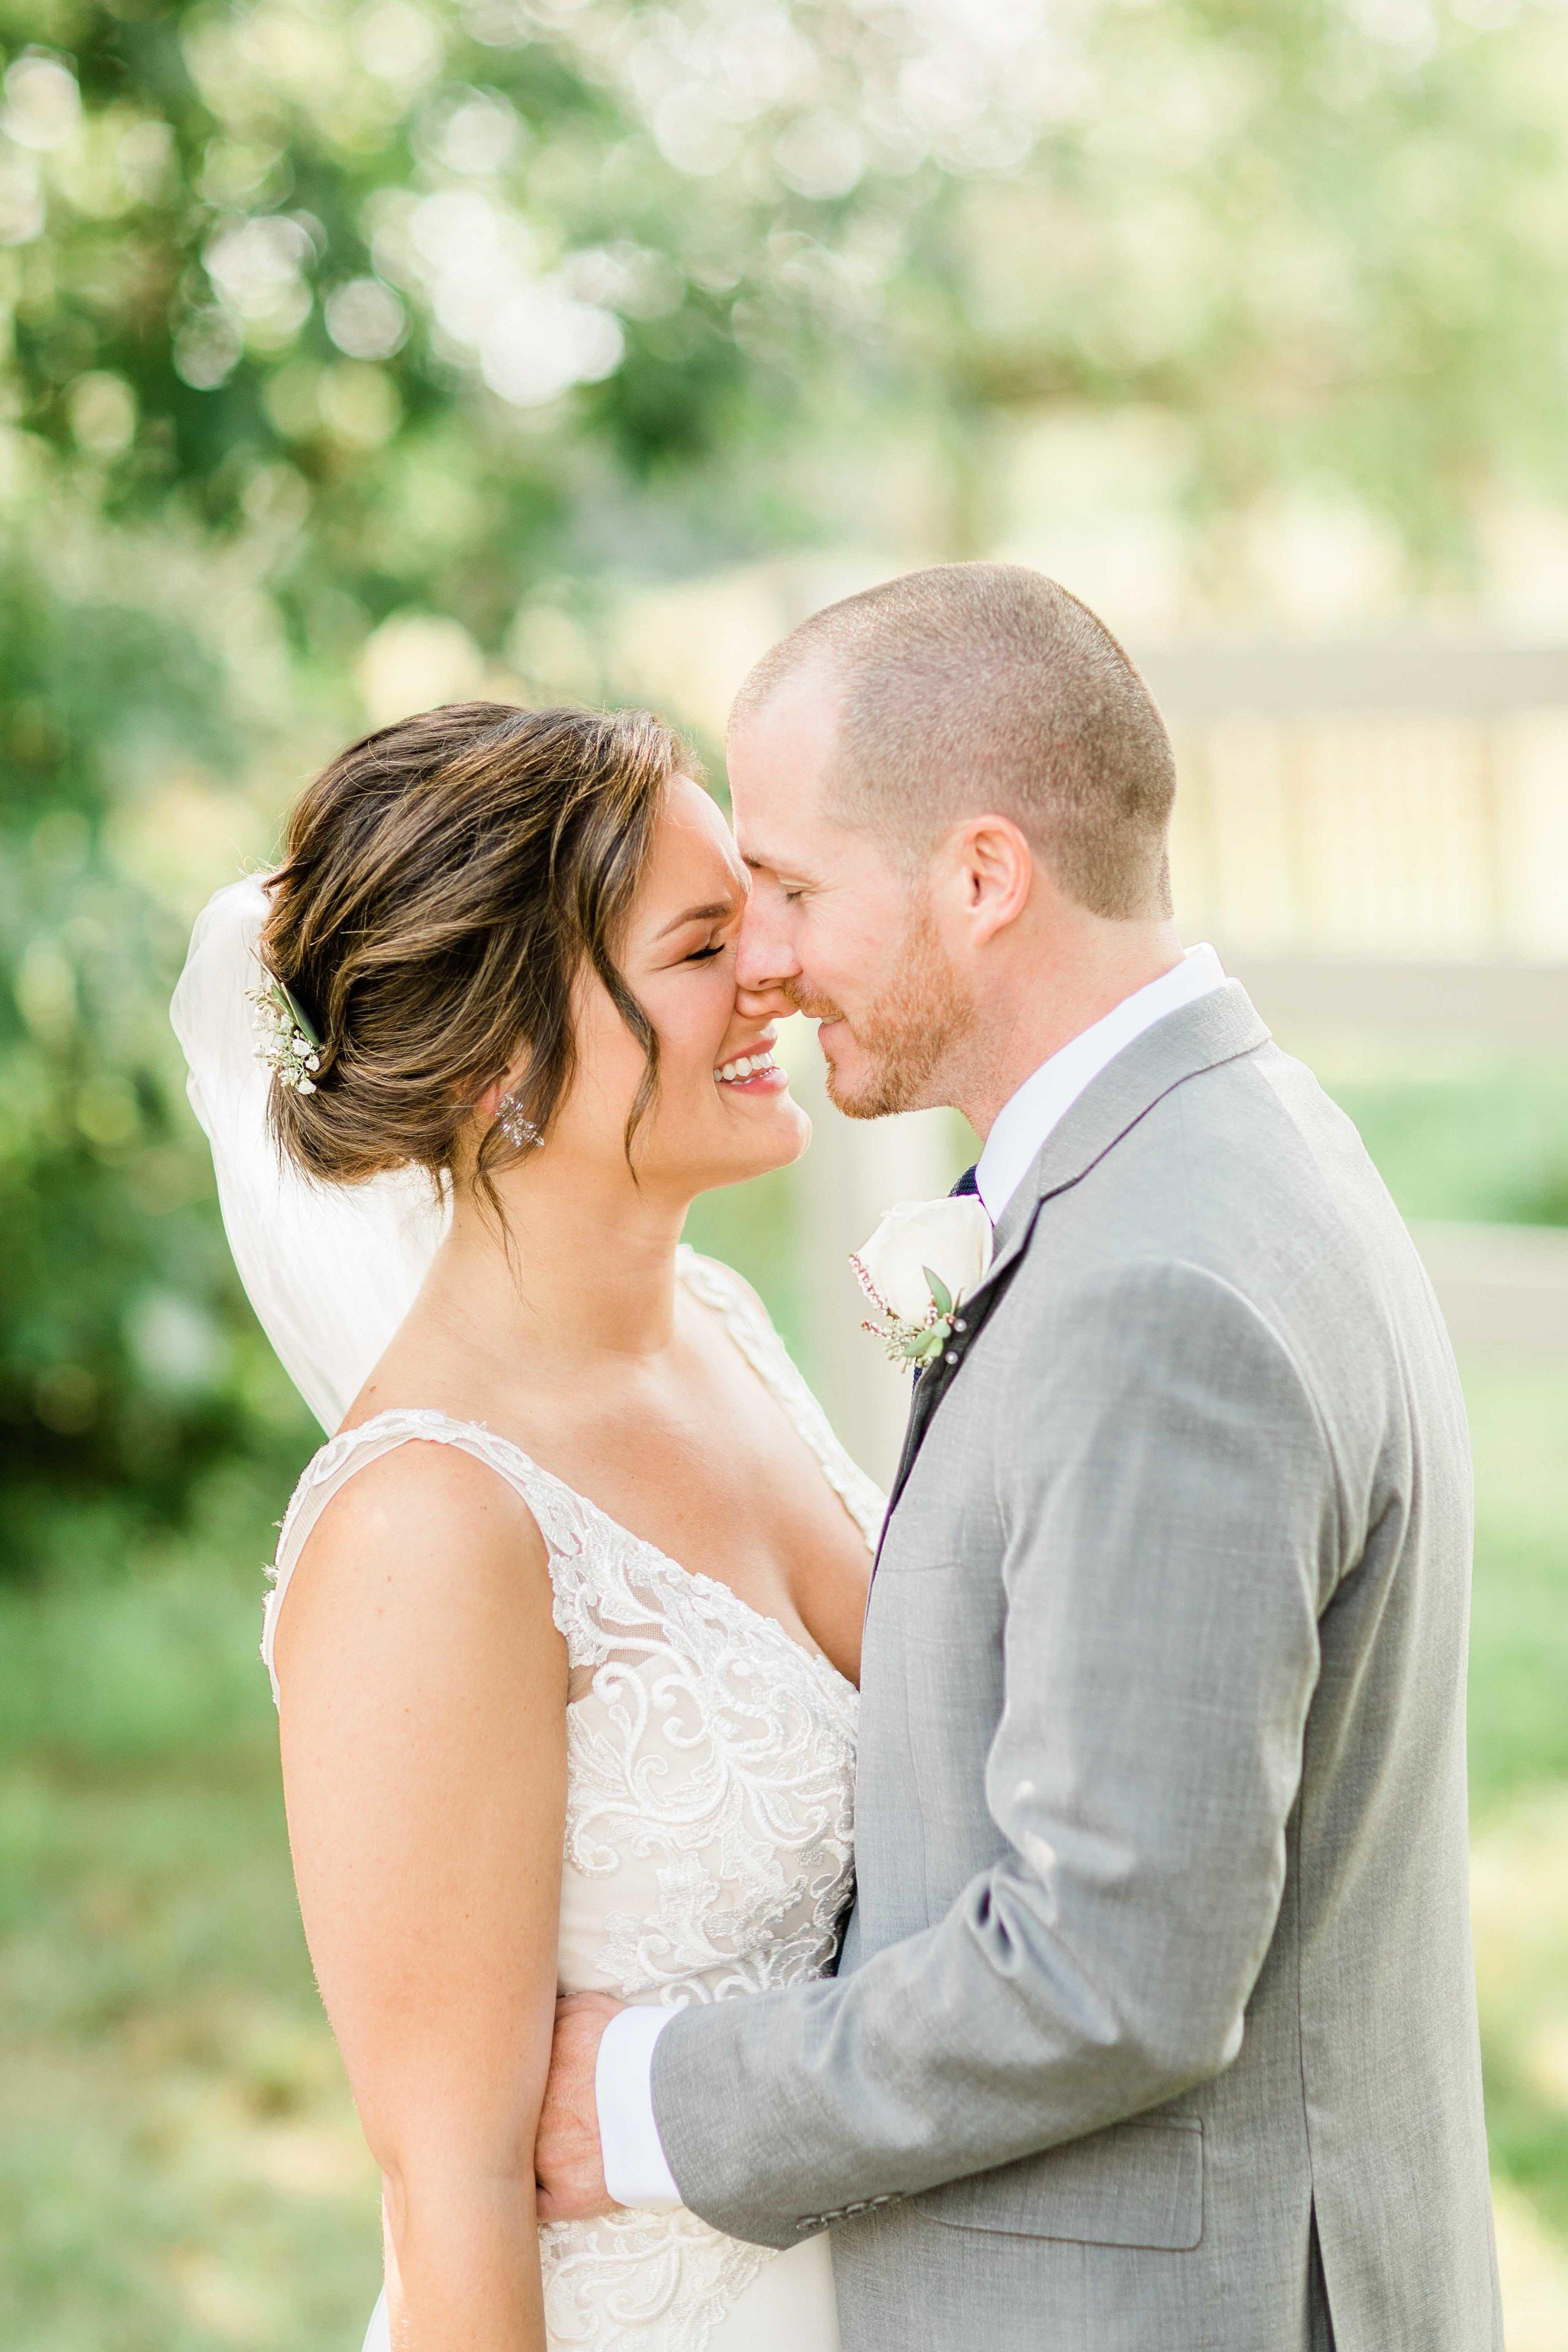 light and airy wedding photographers columbus ohio-1.jpg